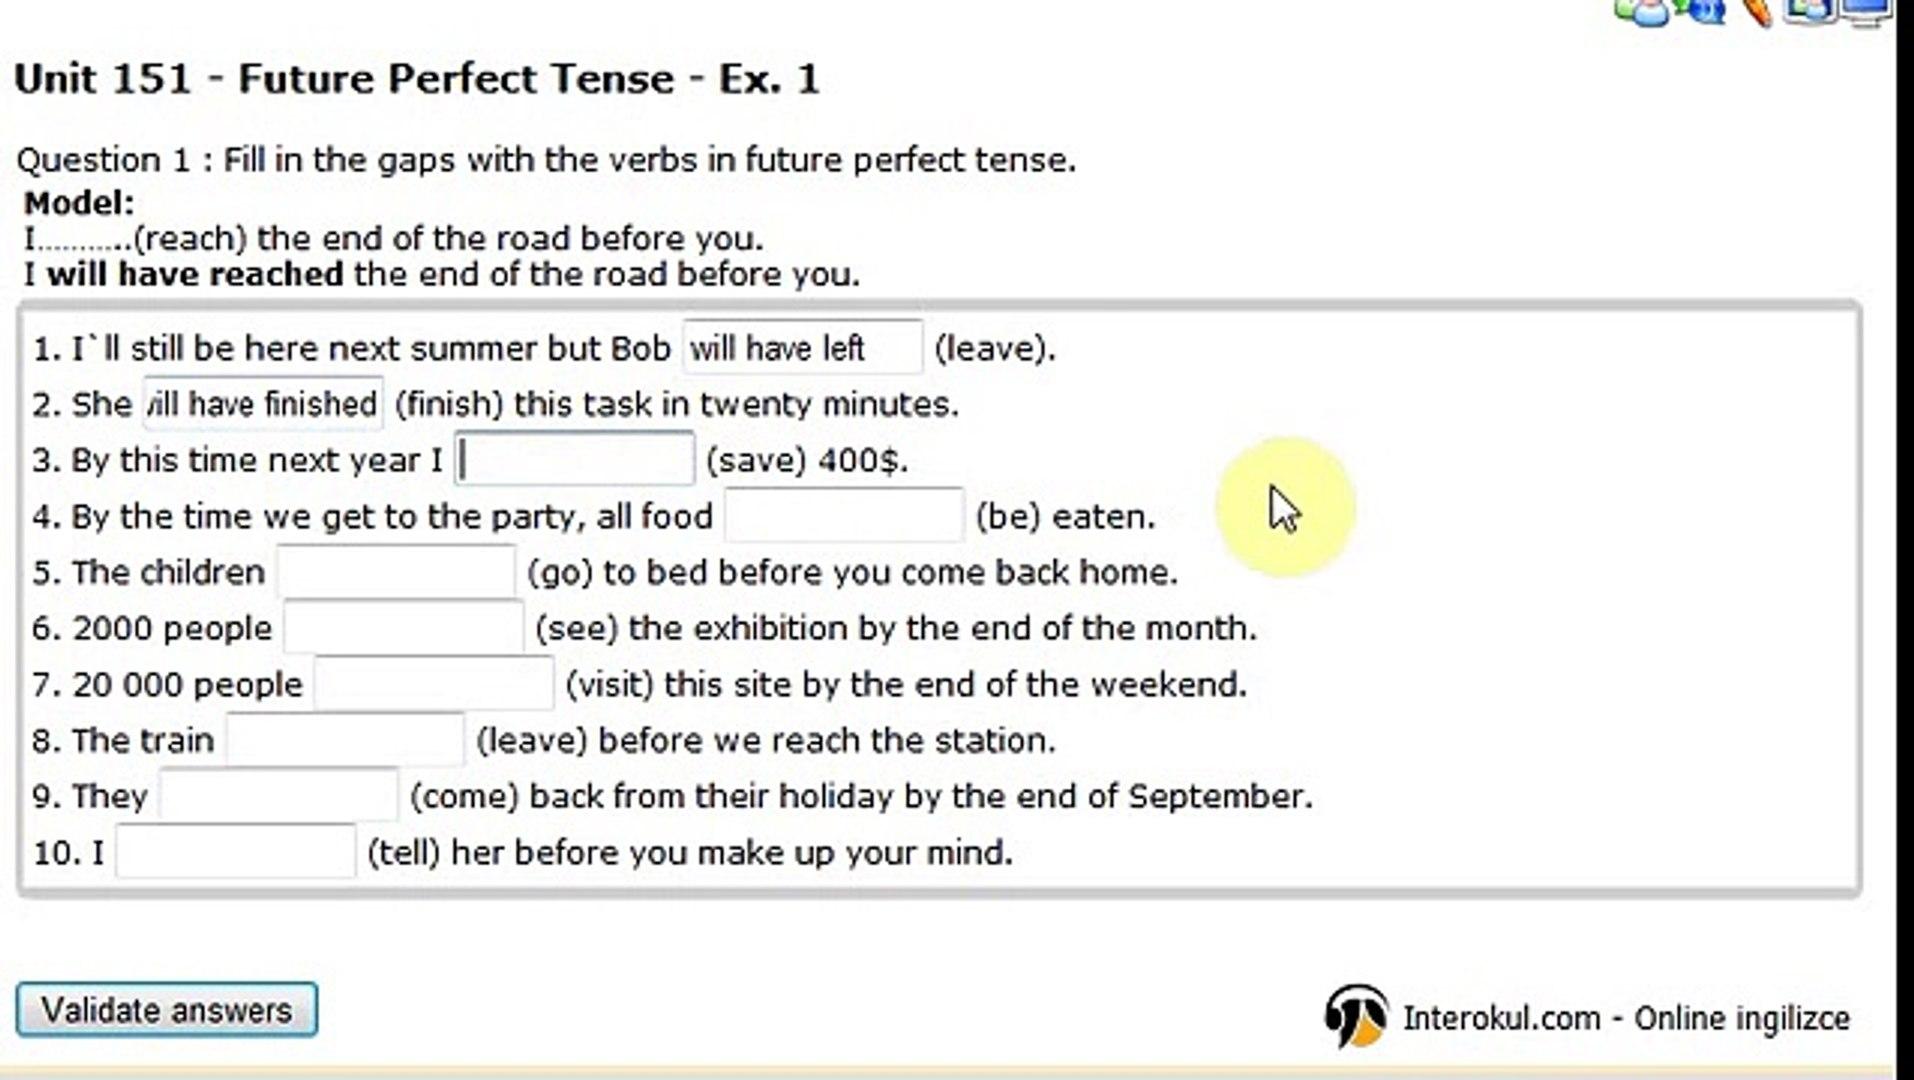 Interokul.com (Learn English Online): Unit 151 Future Perfect Tense exercise 1